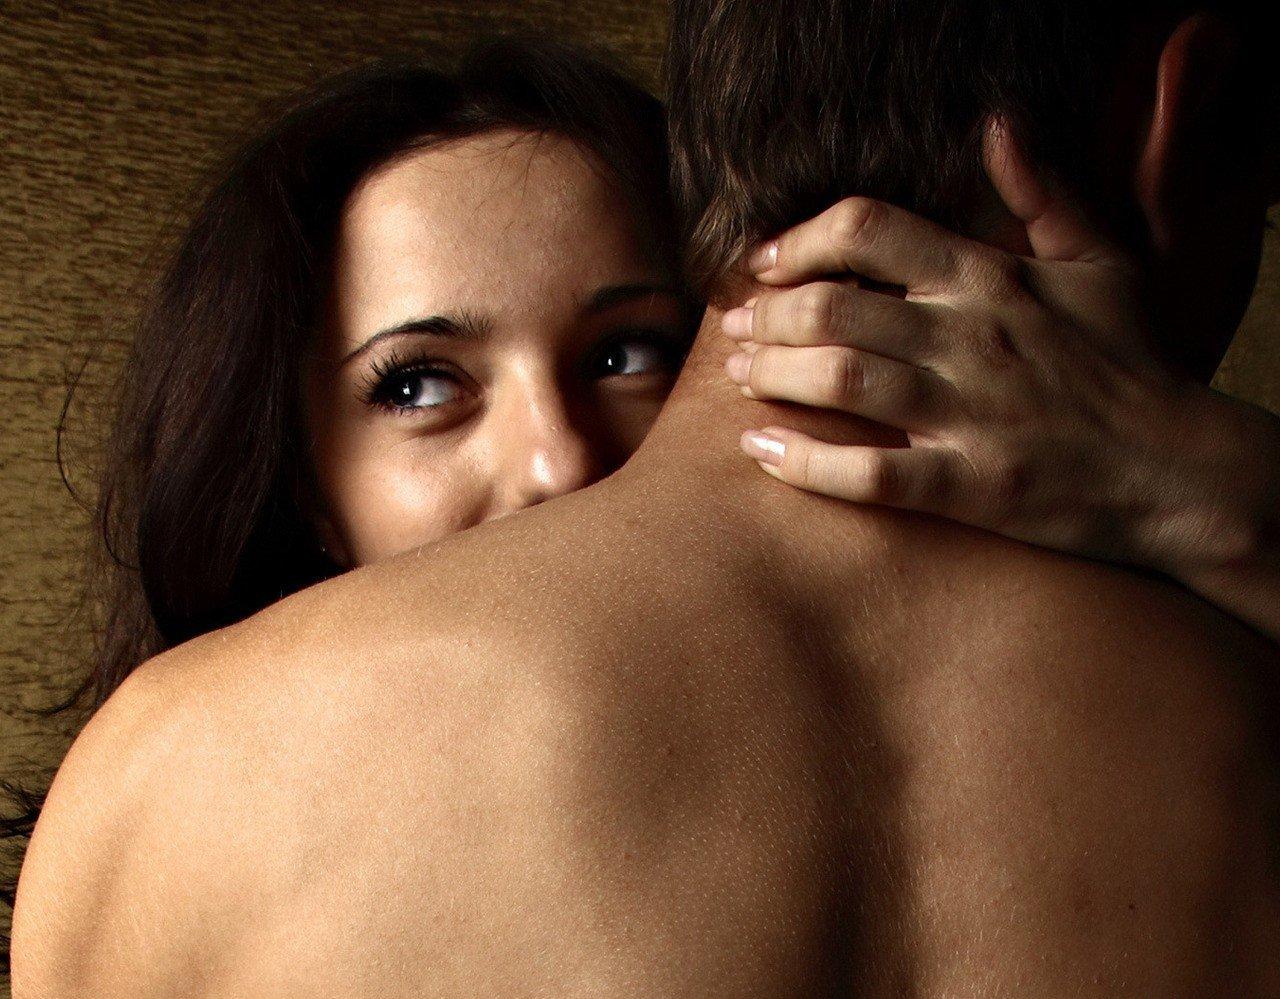 kak-povisit-seksualnoe-vlechenie